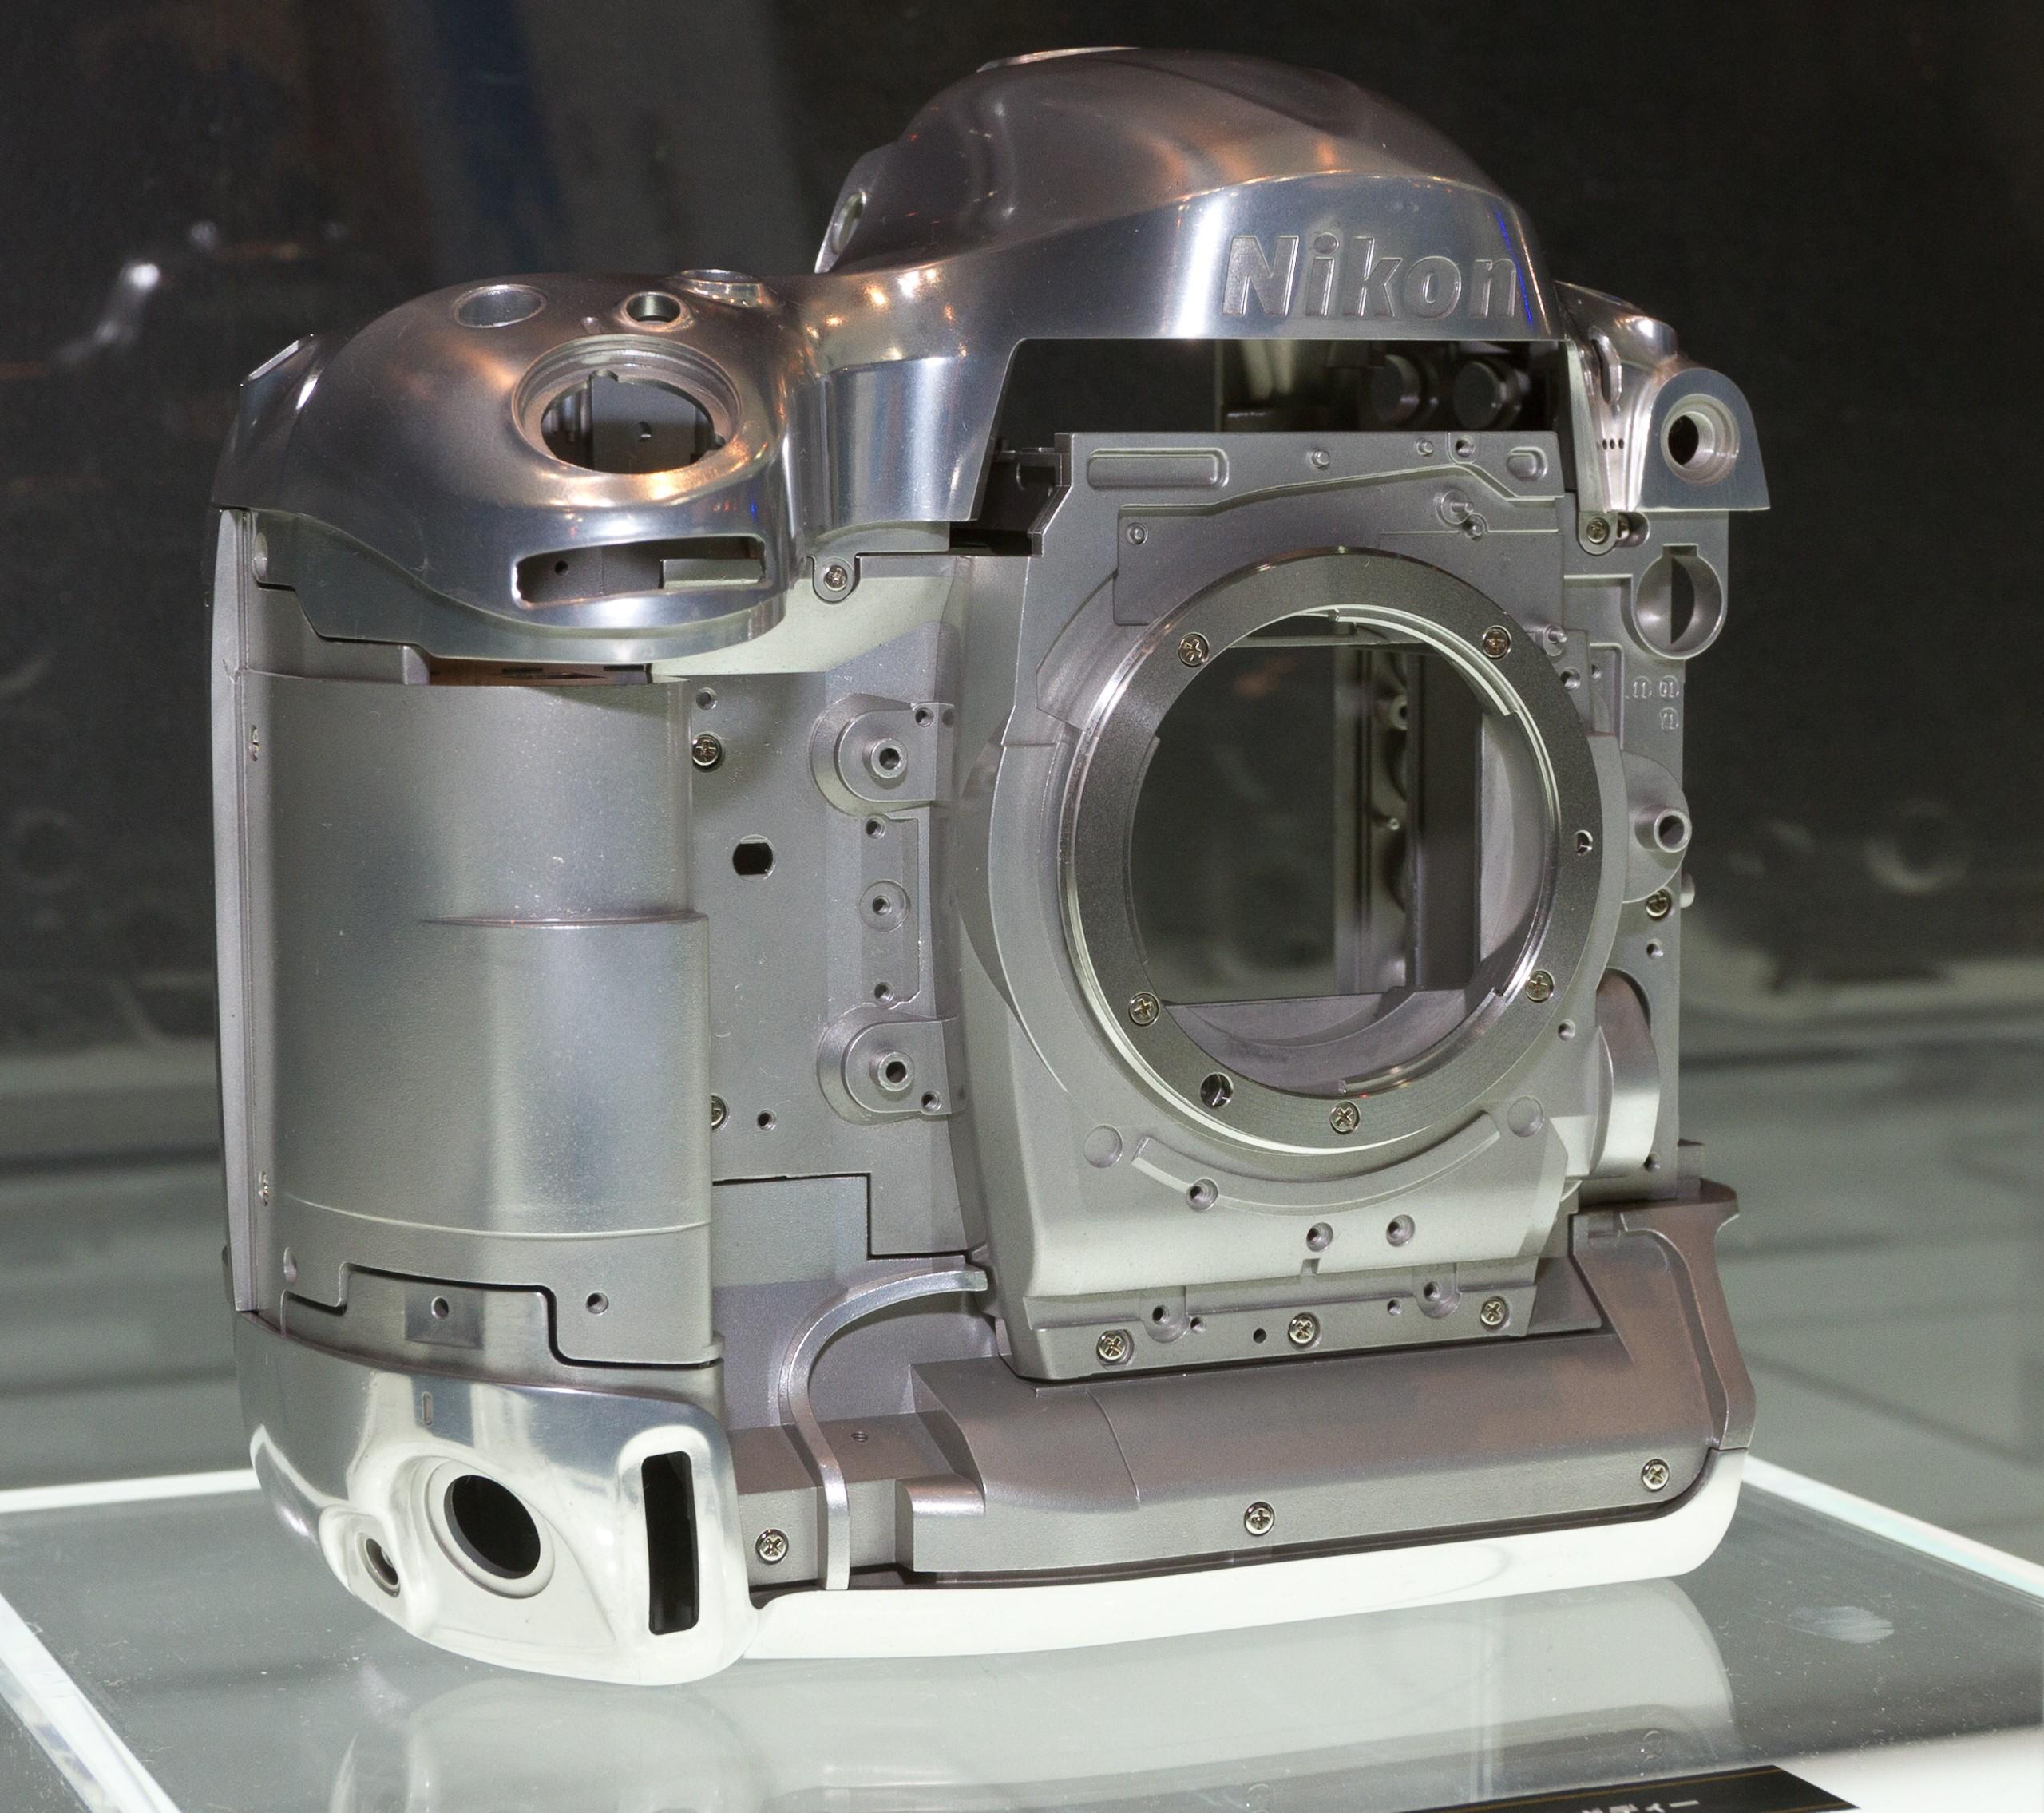 2012_Nikon_D4_magnesium-alloy_frame_2012_CP+